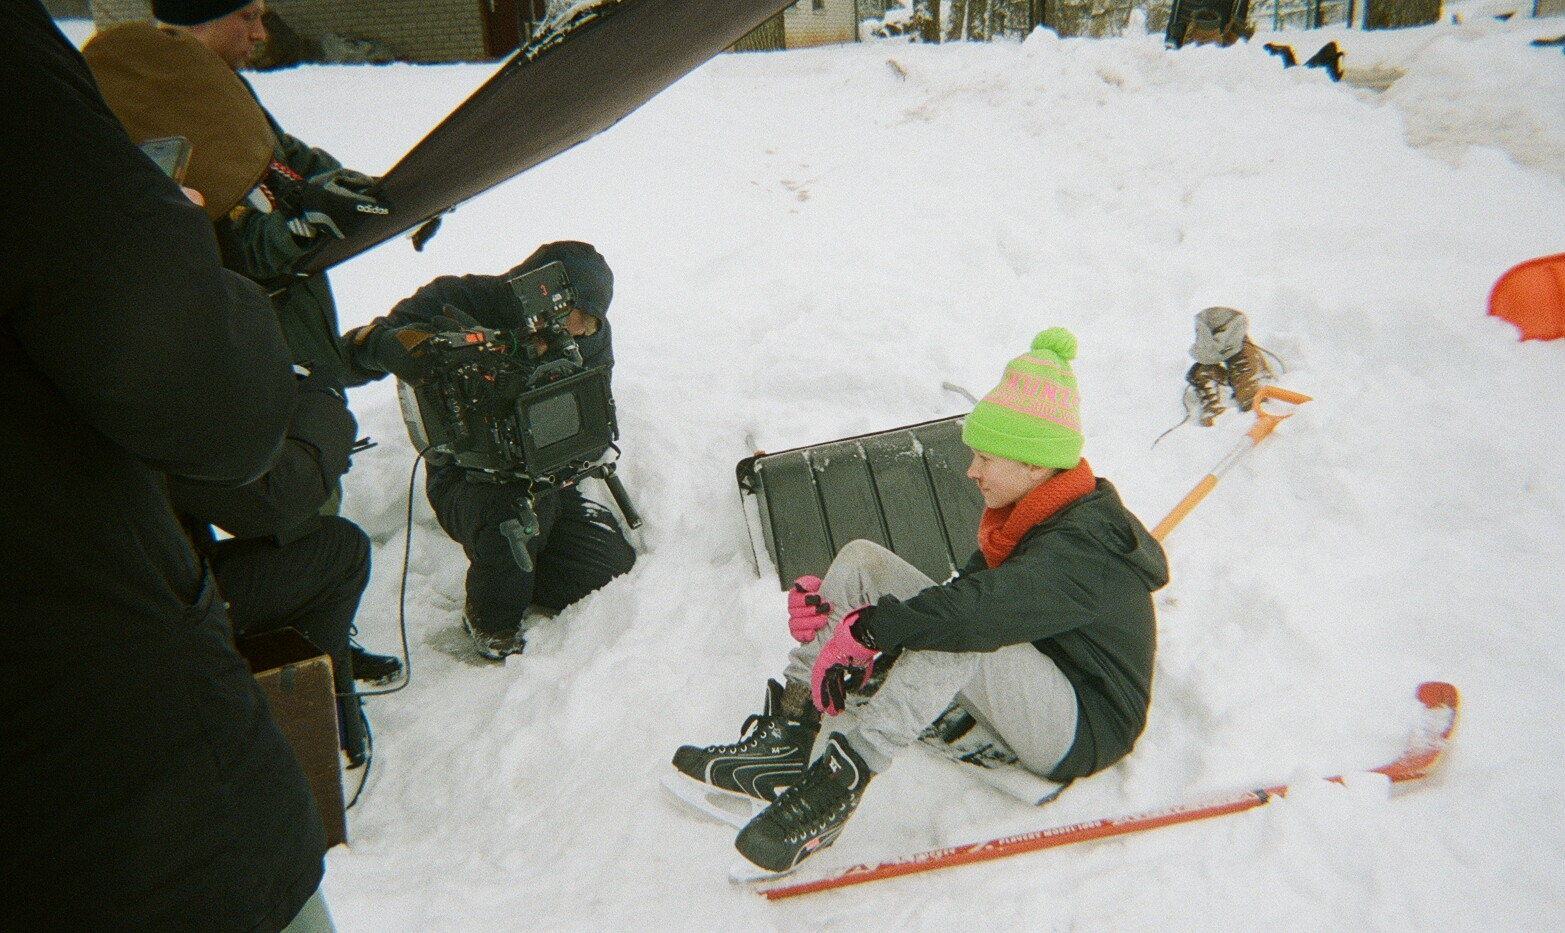 Filming the ice hockey scene.